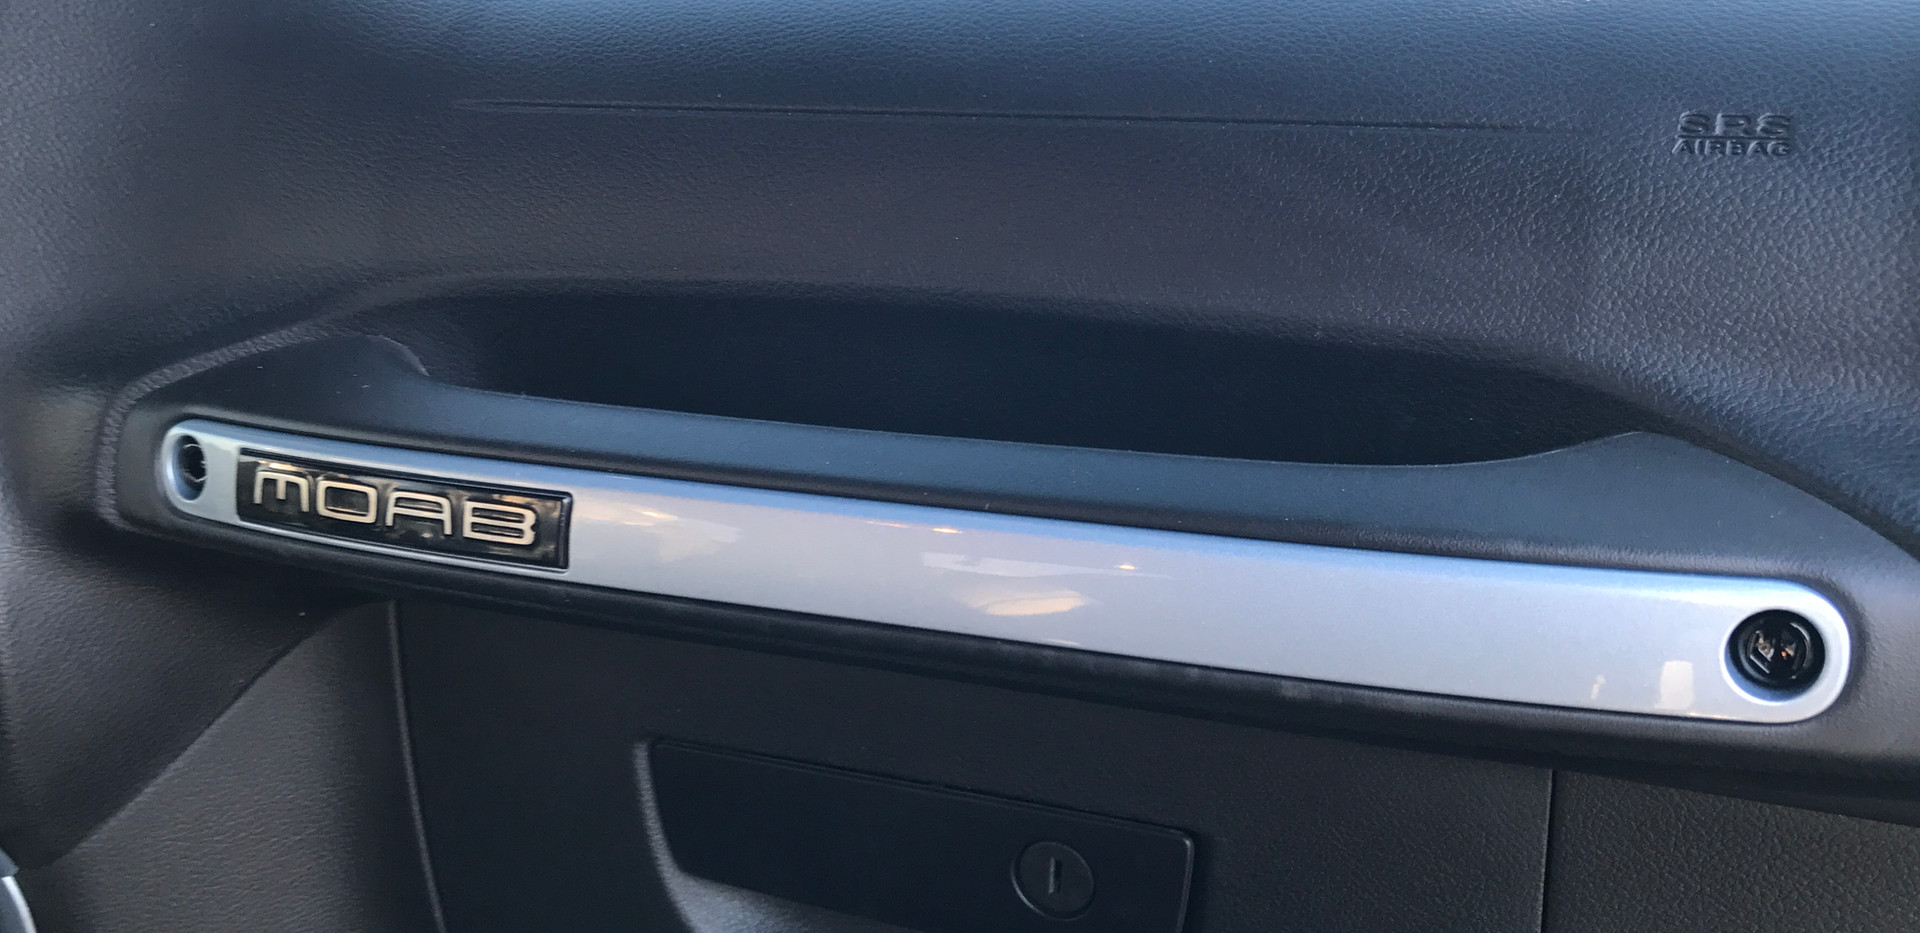 Blue and Black Jeep Interior